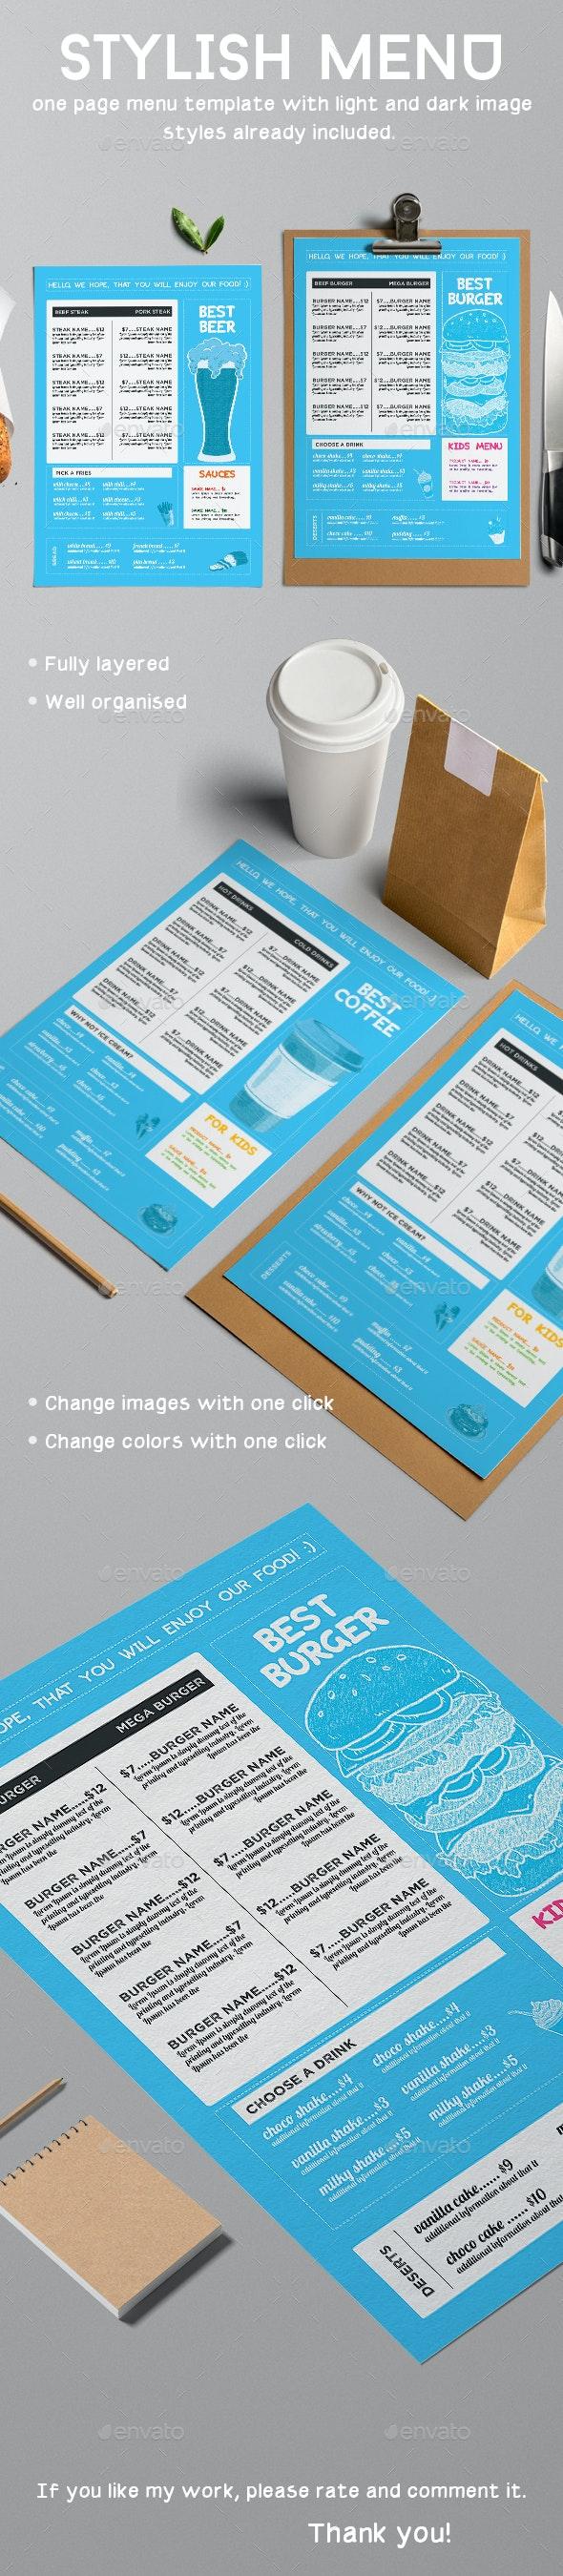 Stylish and Modern Menu Template - Food Menus Print Templates